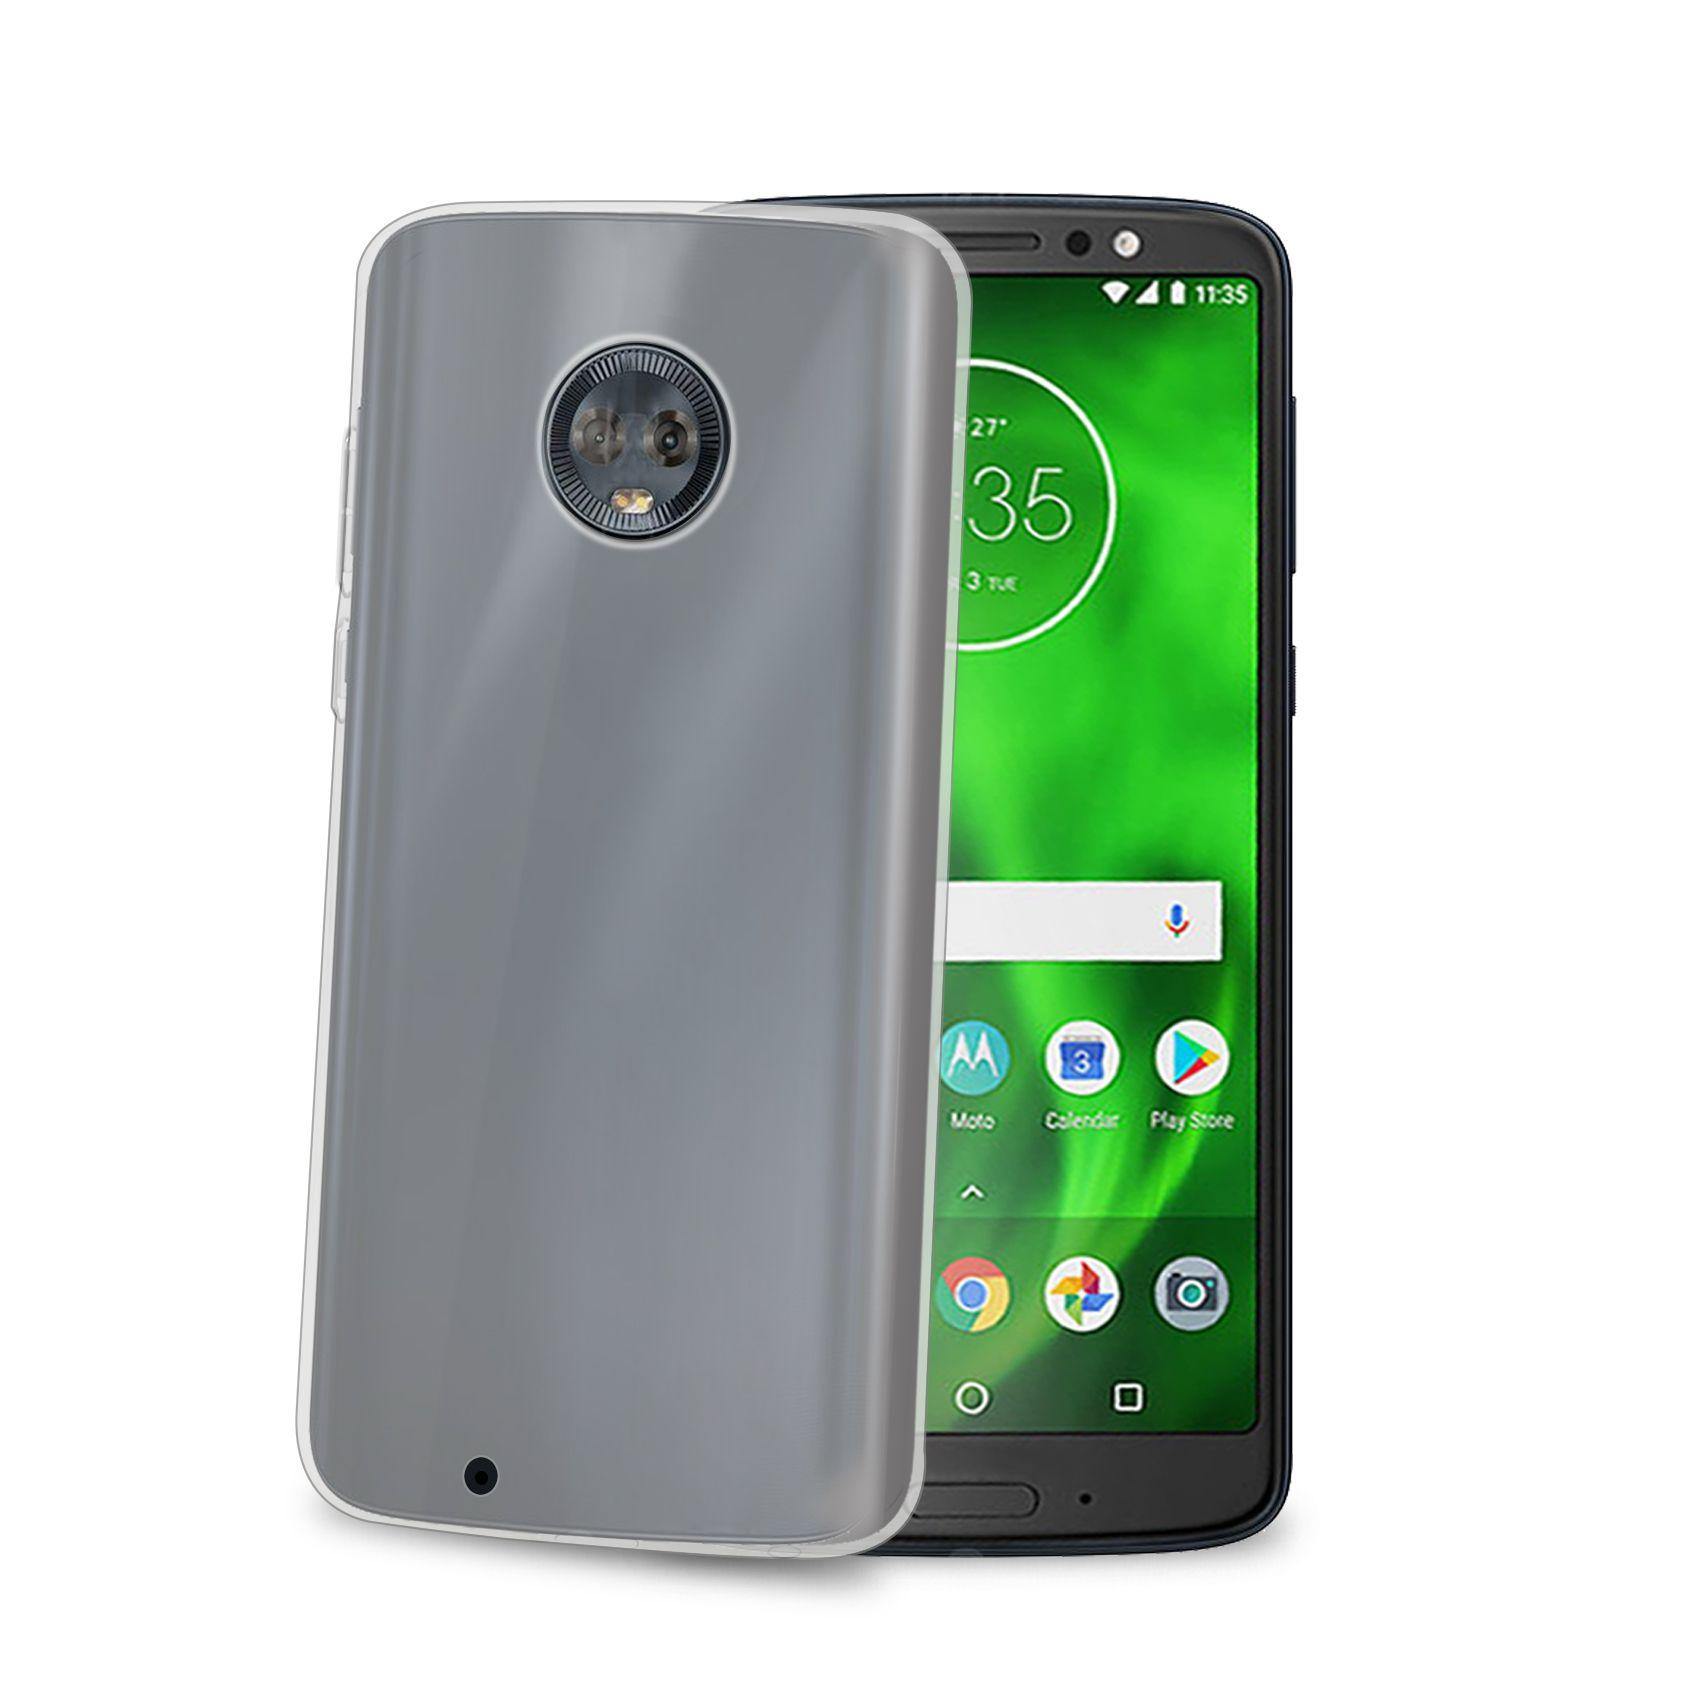 TPU pouzdro CELLY Gelskin pro Motorola Moto G6, bezbarvé